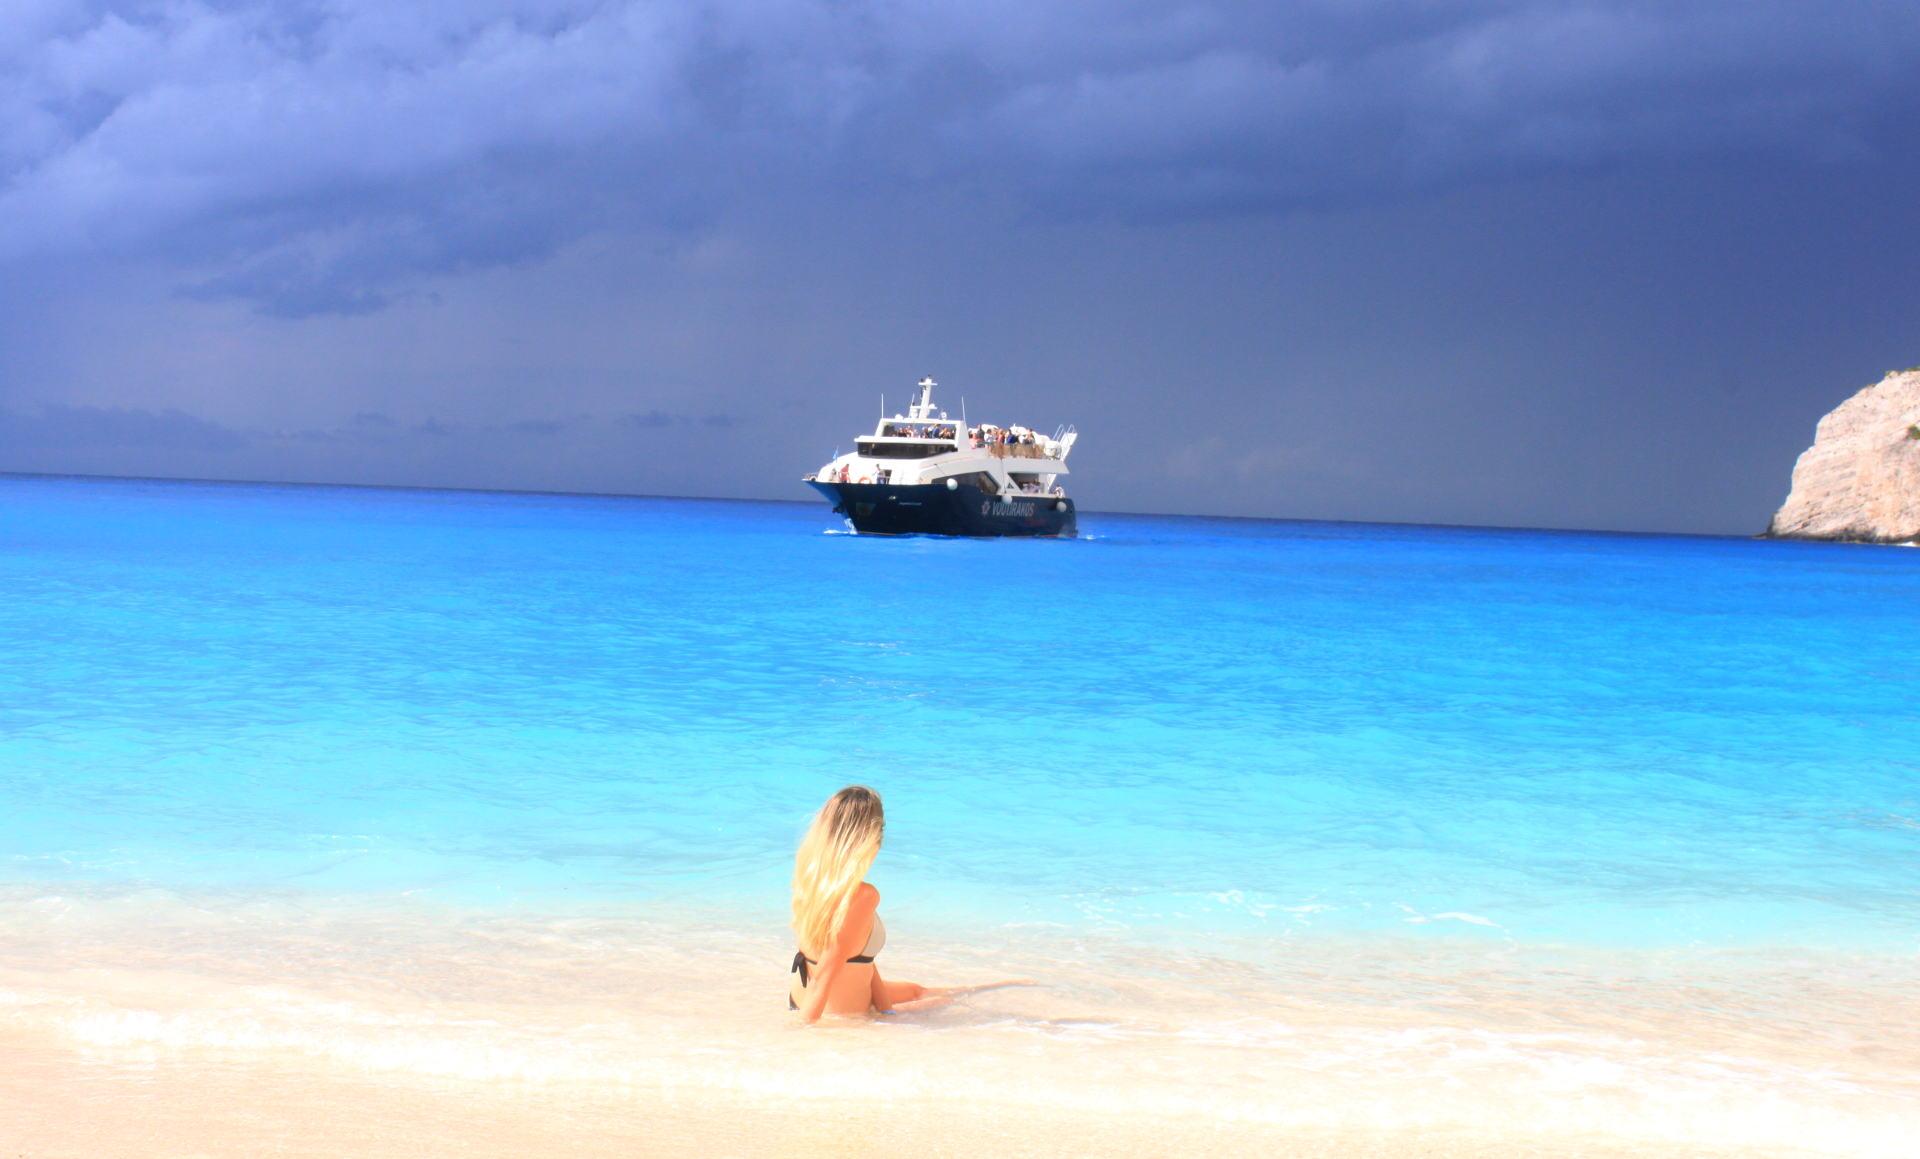 grecja zakynthos zatokawraku navagiobeach statek rajskaplaza iglawpodrozy